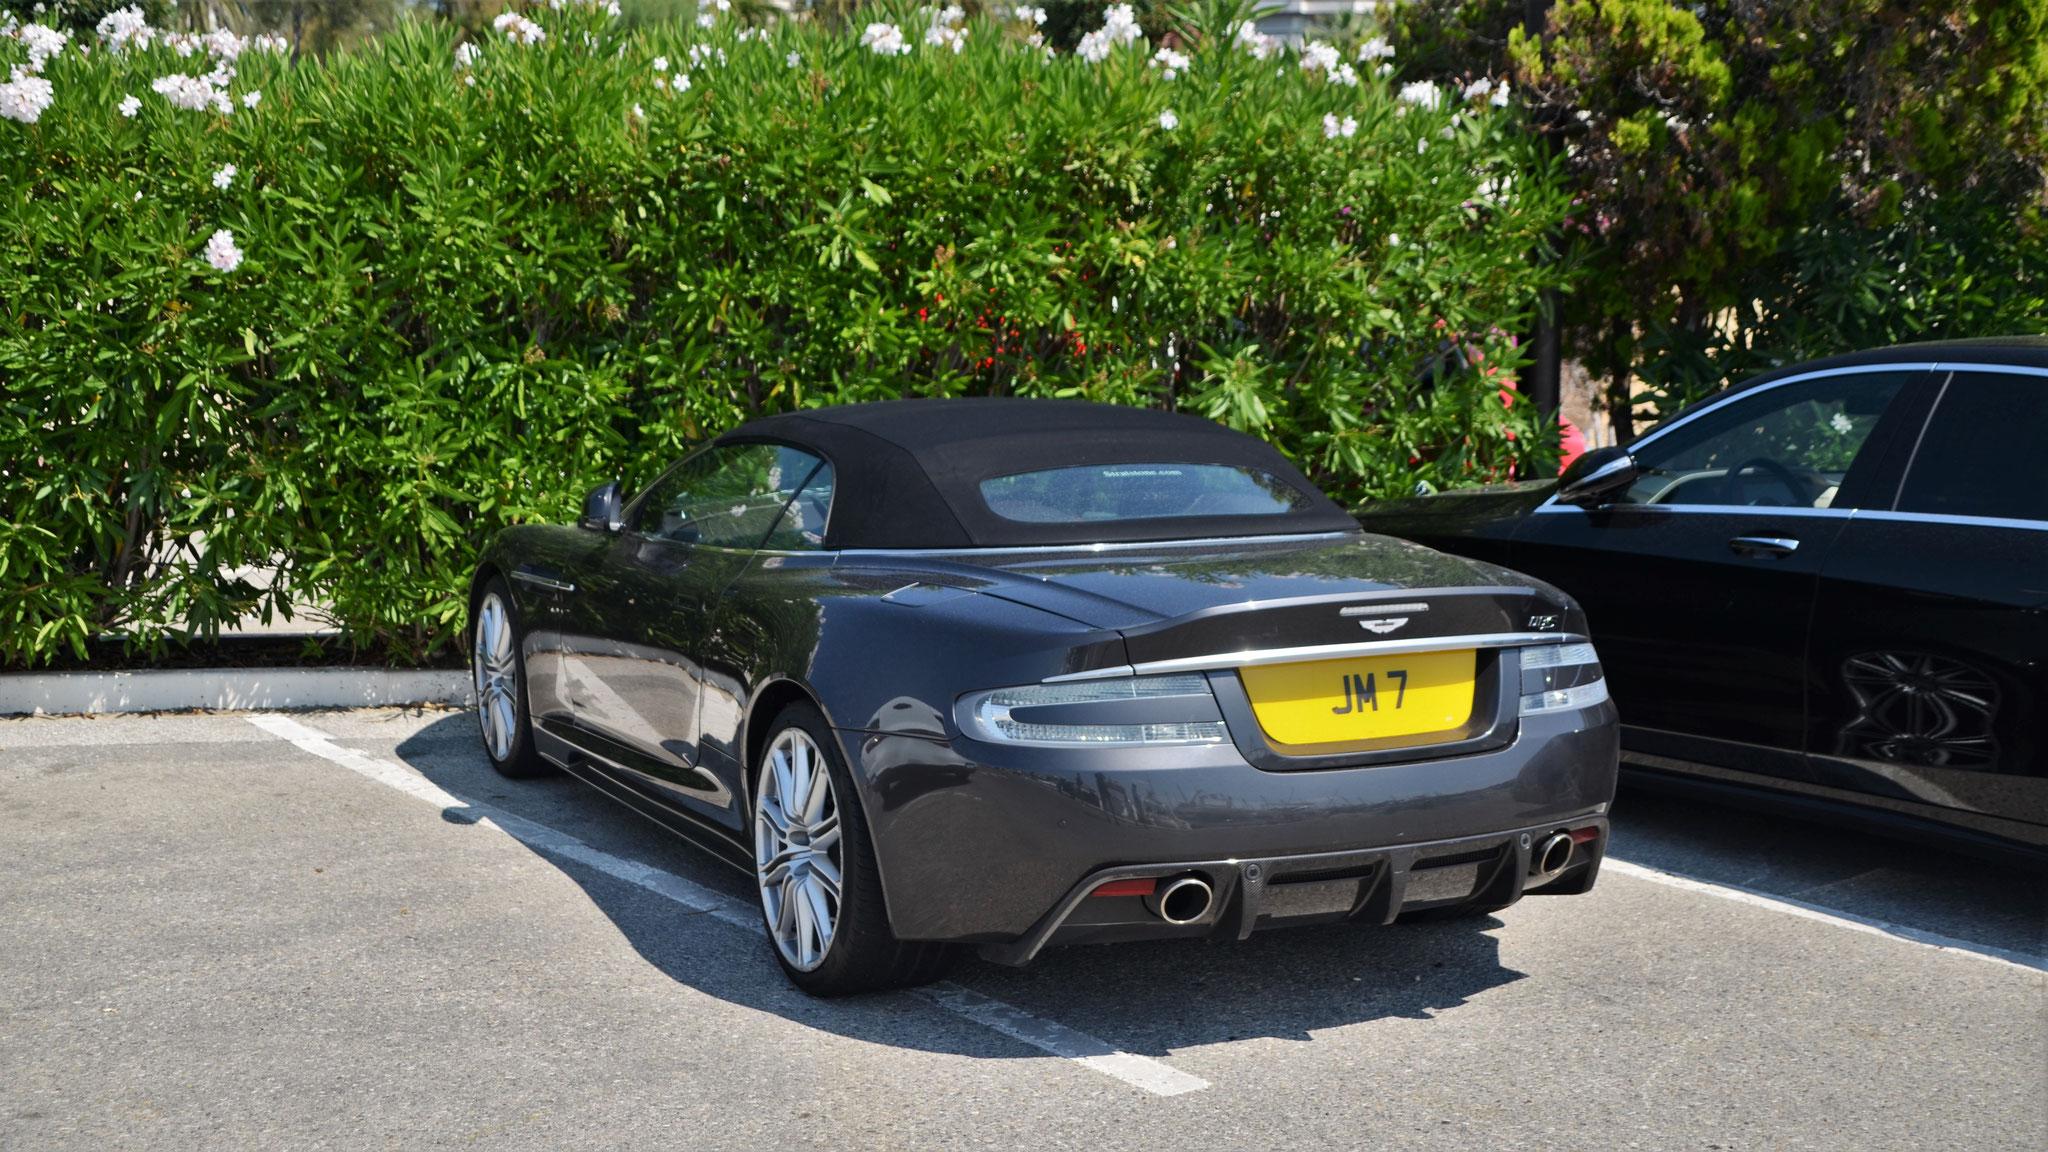 Aston Martin DBS Volante - JM-7 (GB)